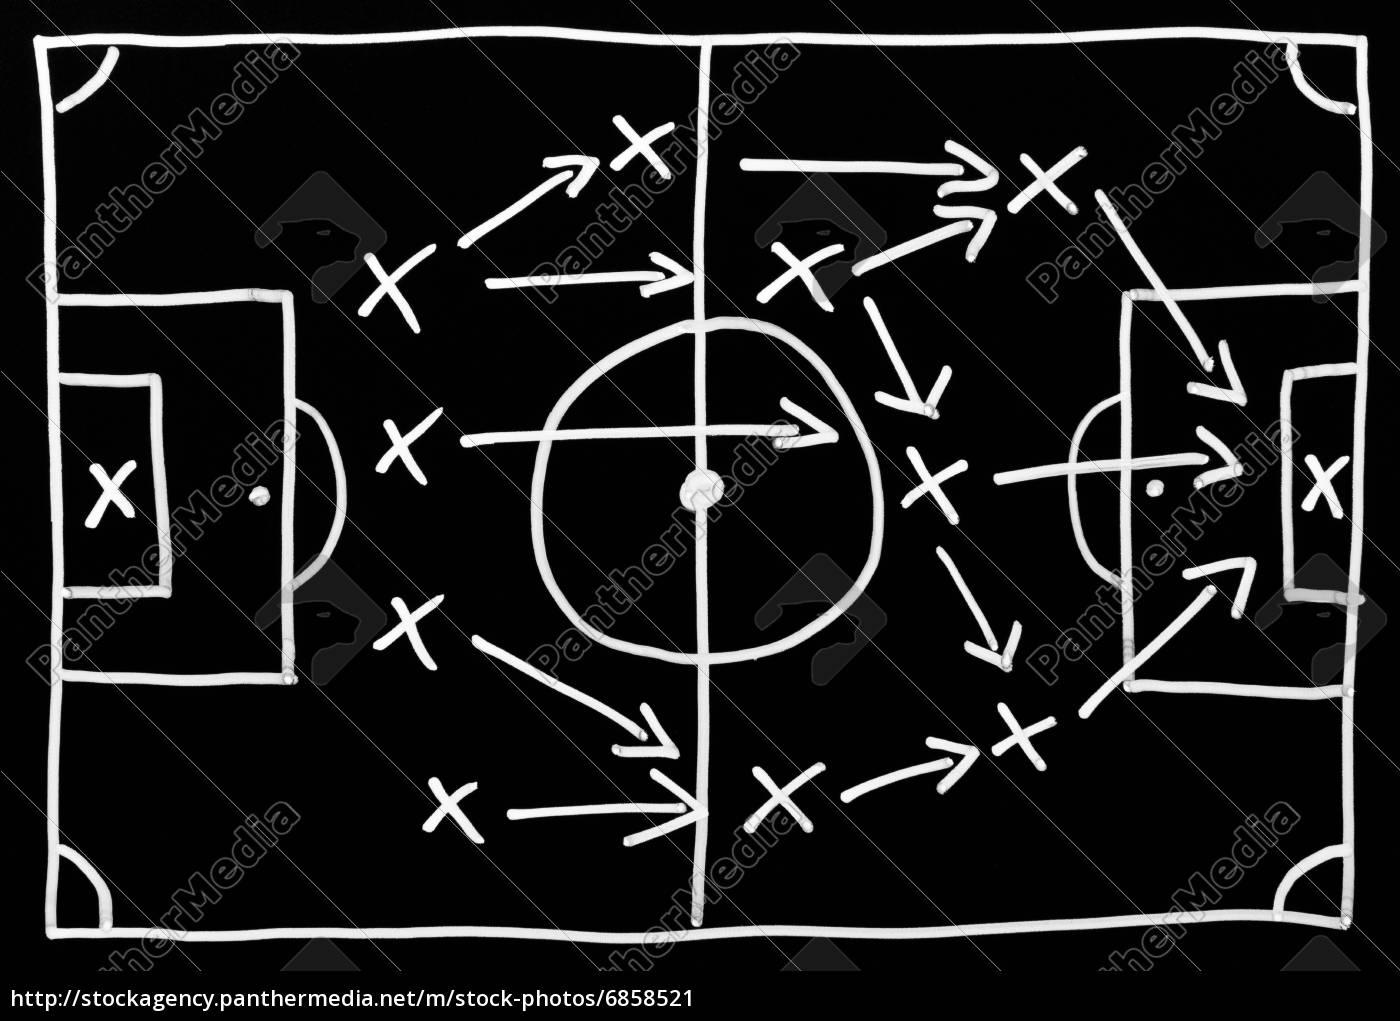 Fussball Taktik